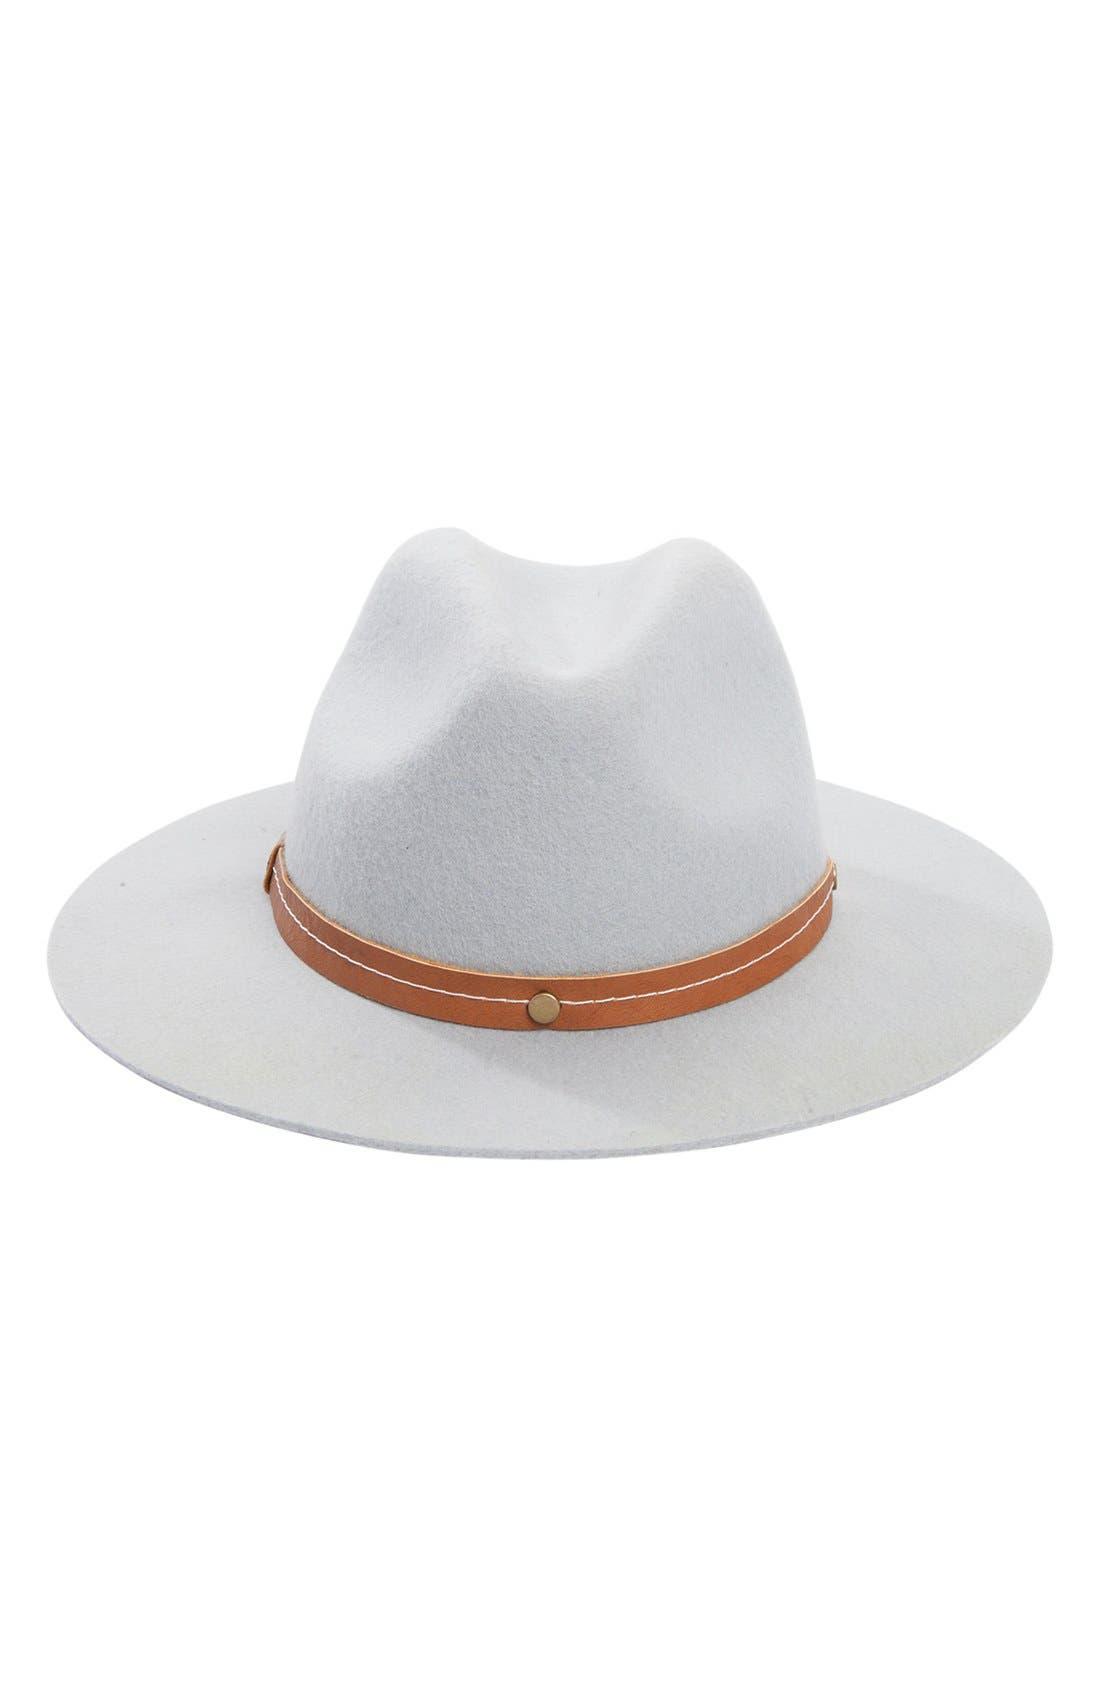 Alternate Image 1 Selected - Billabong 'Moon Gaze' Wool Panama Hat